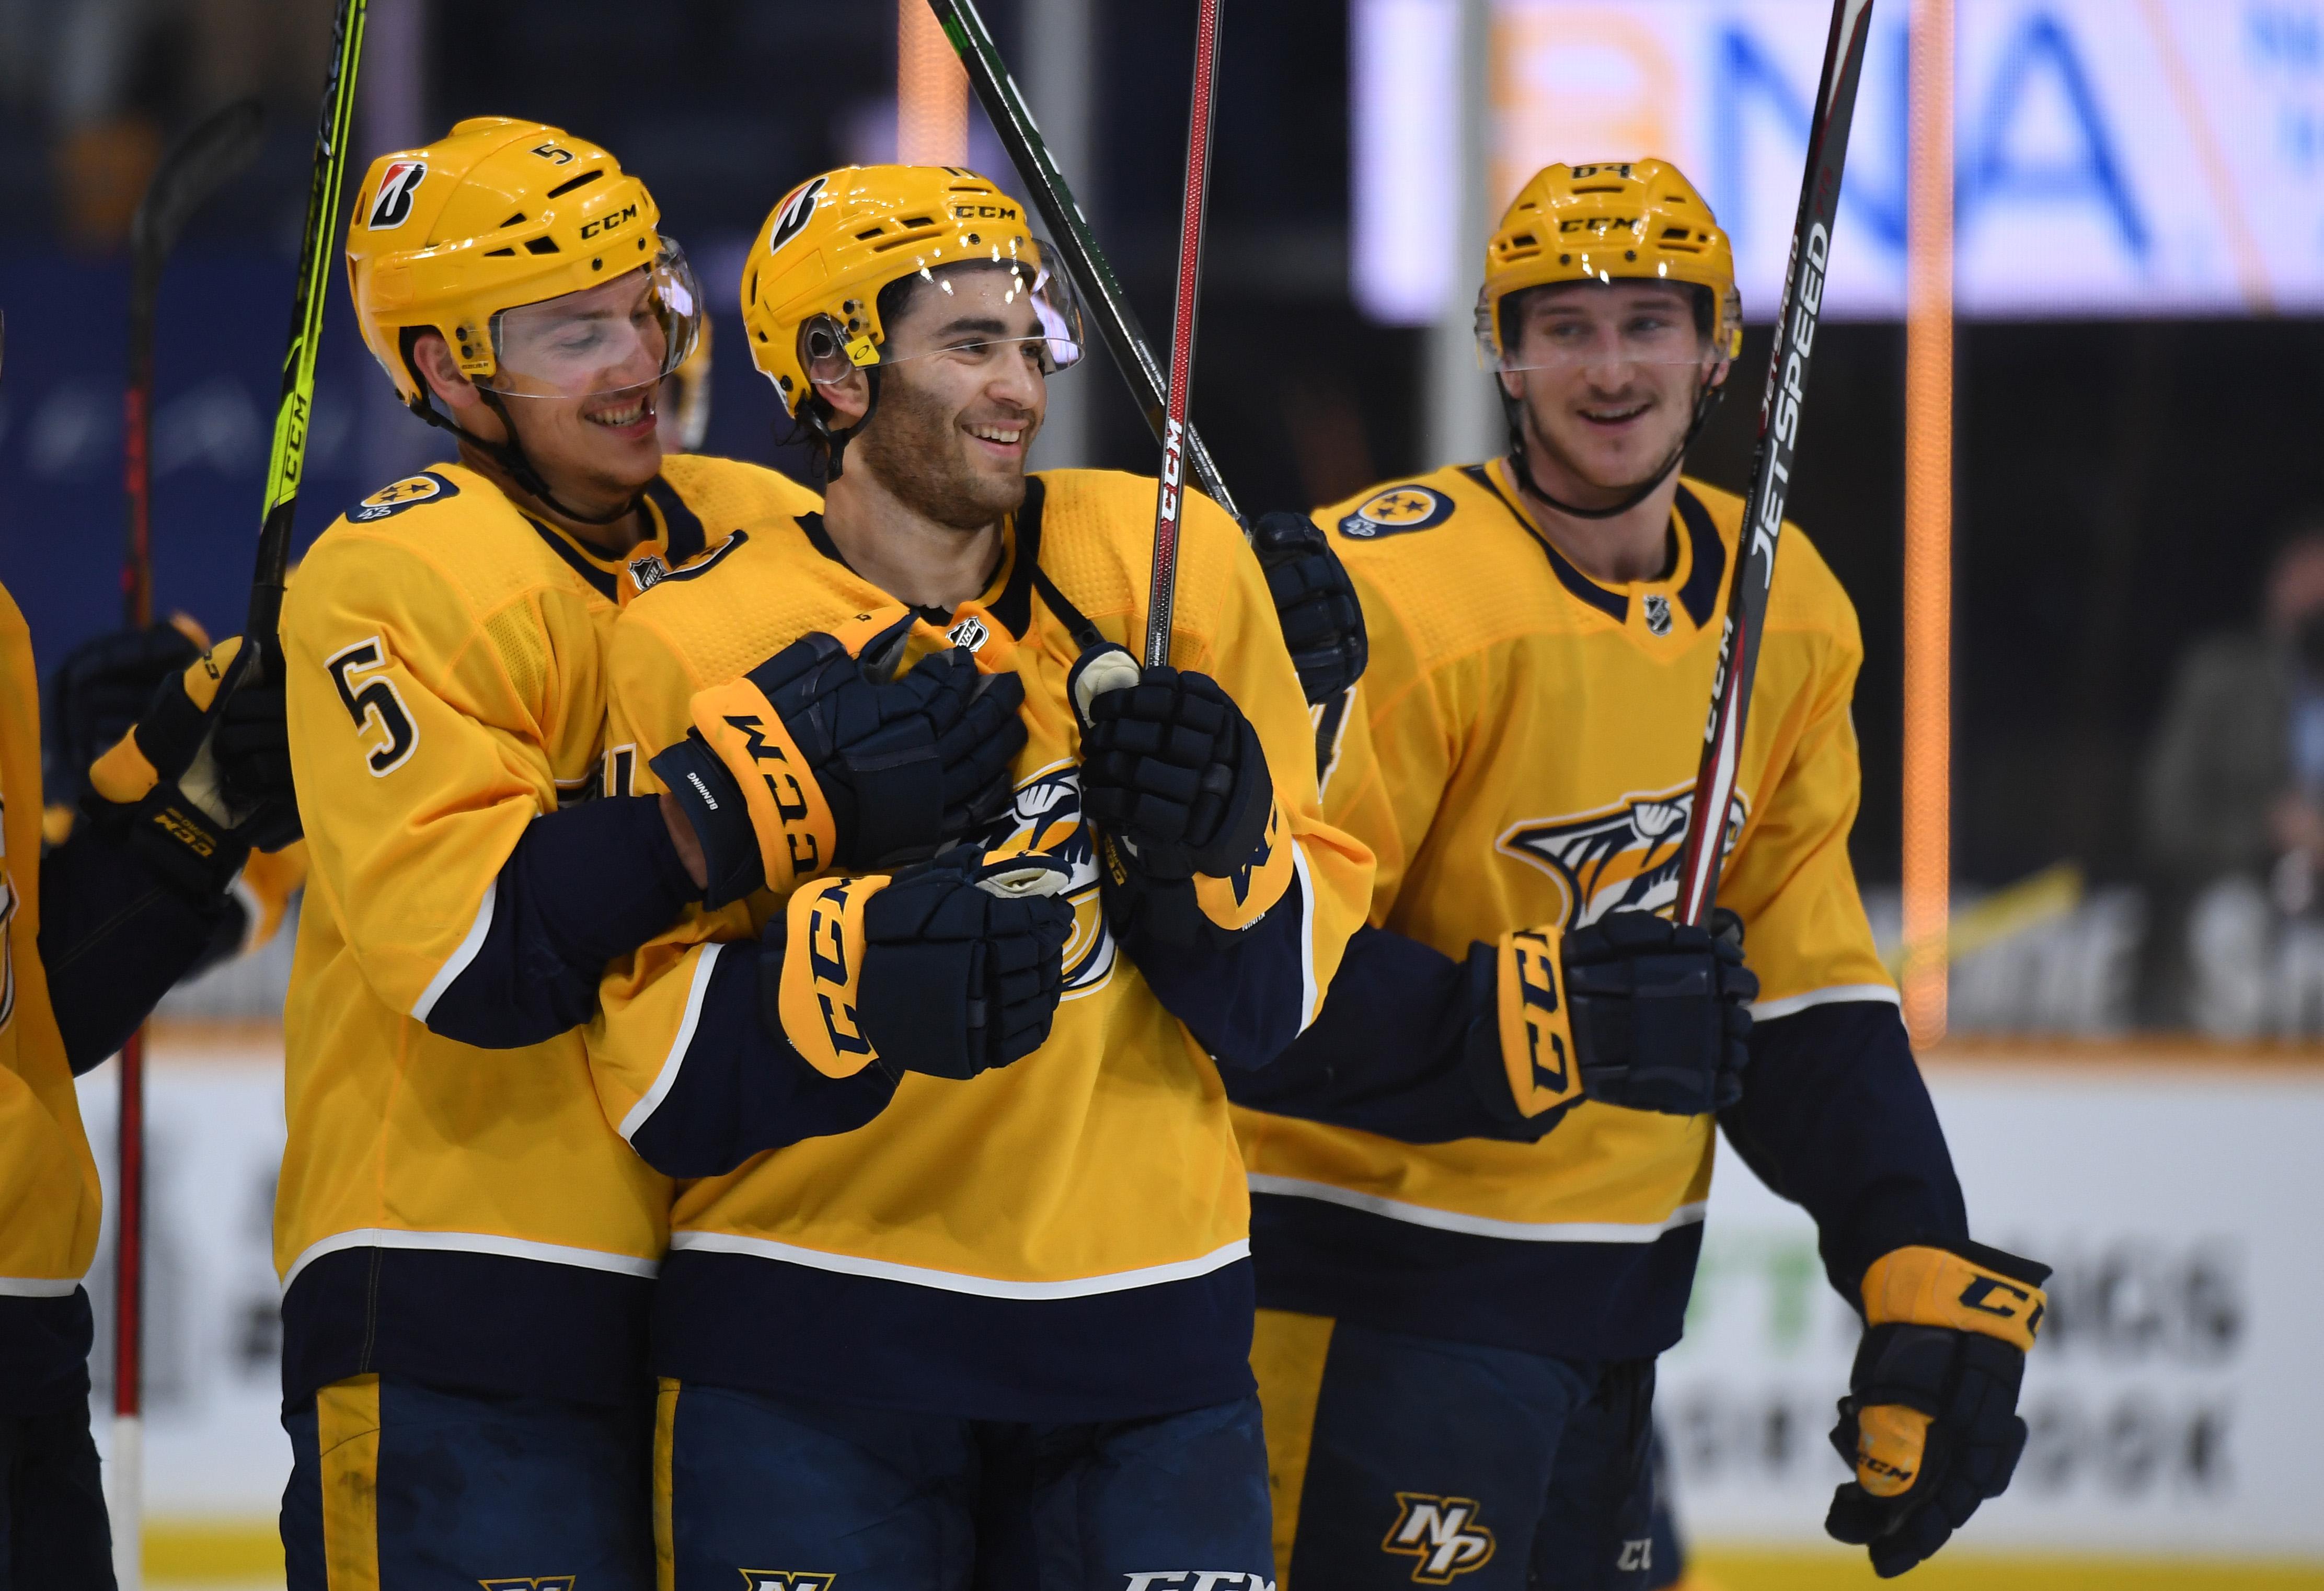 NHL: Carolina Hurricanes at Nashville Predators